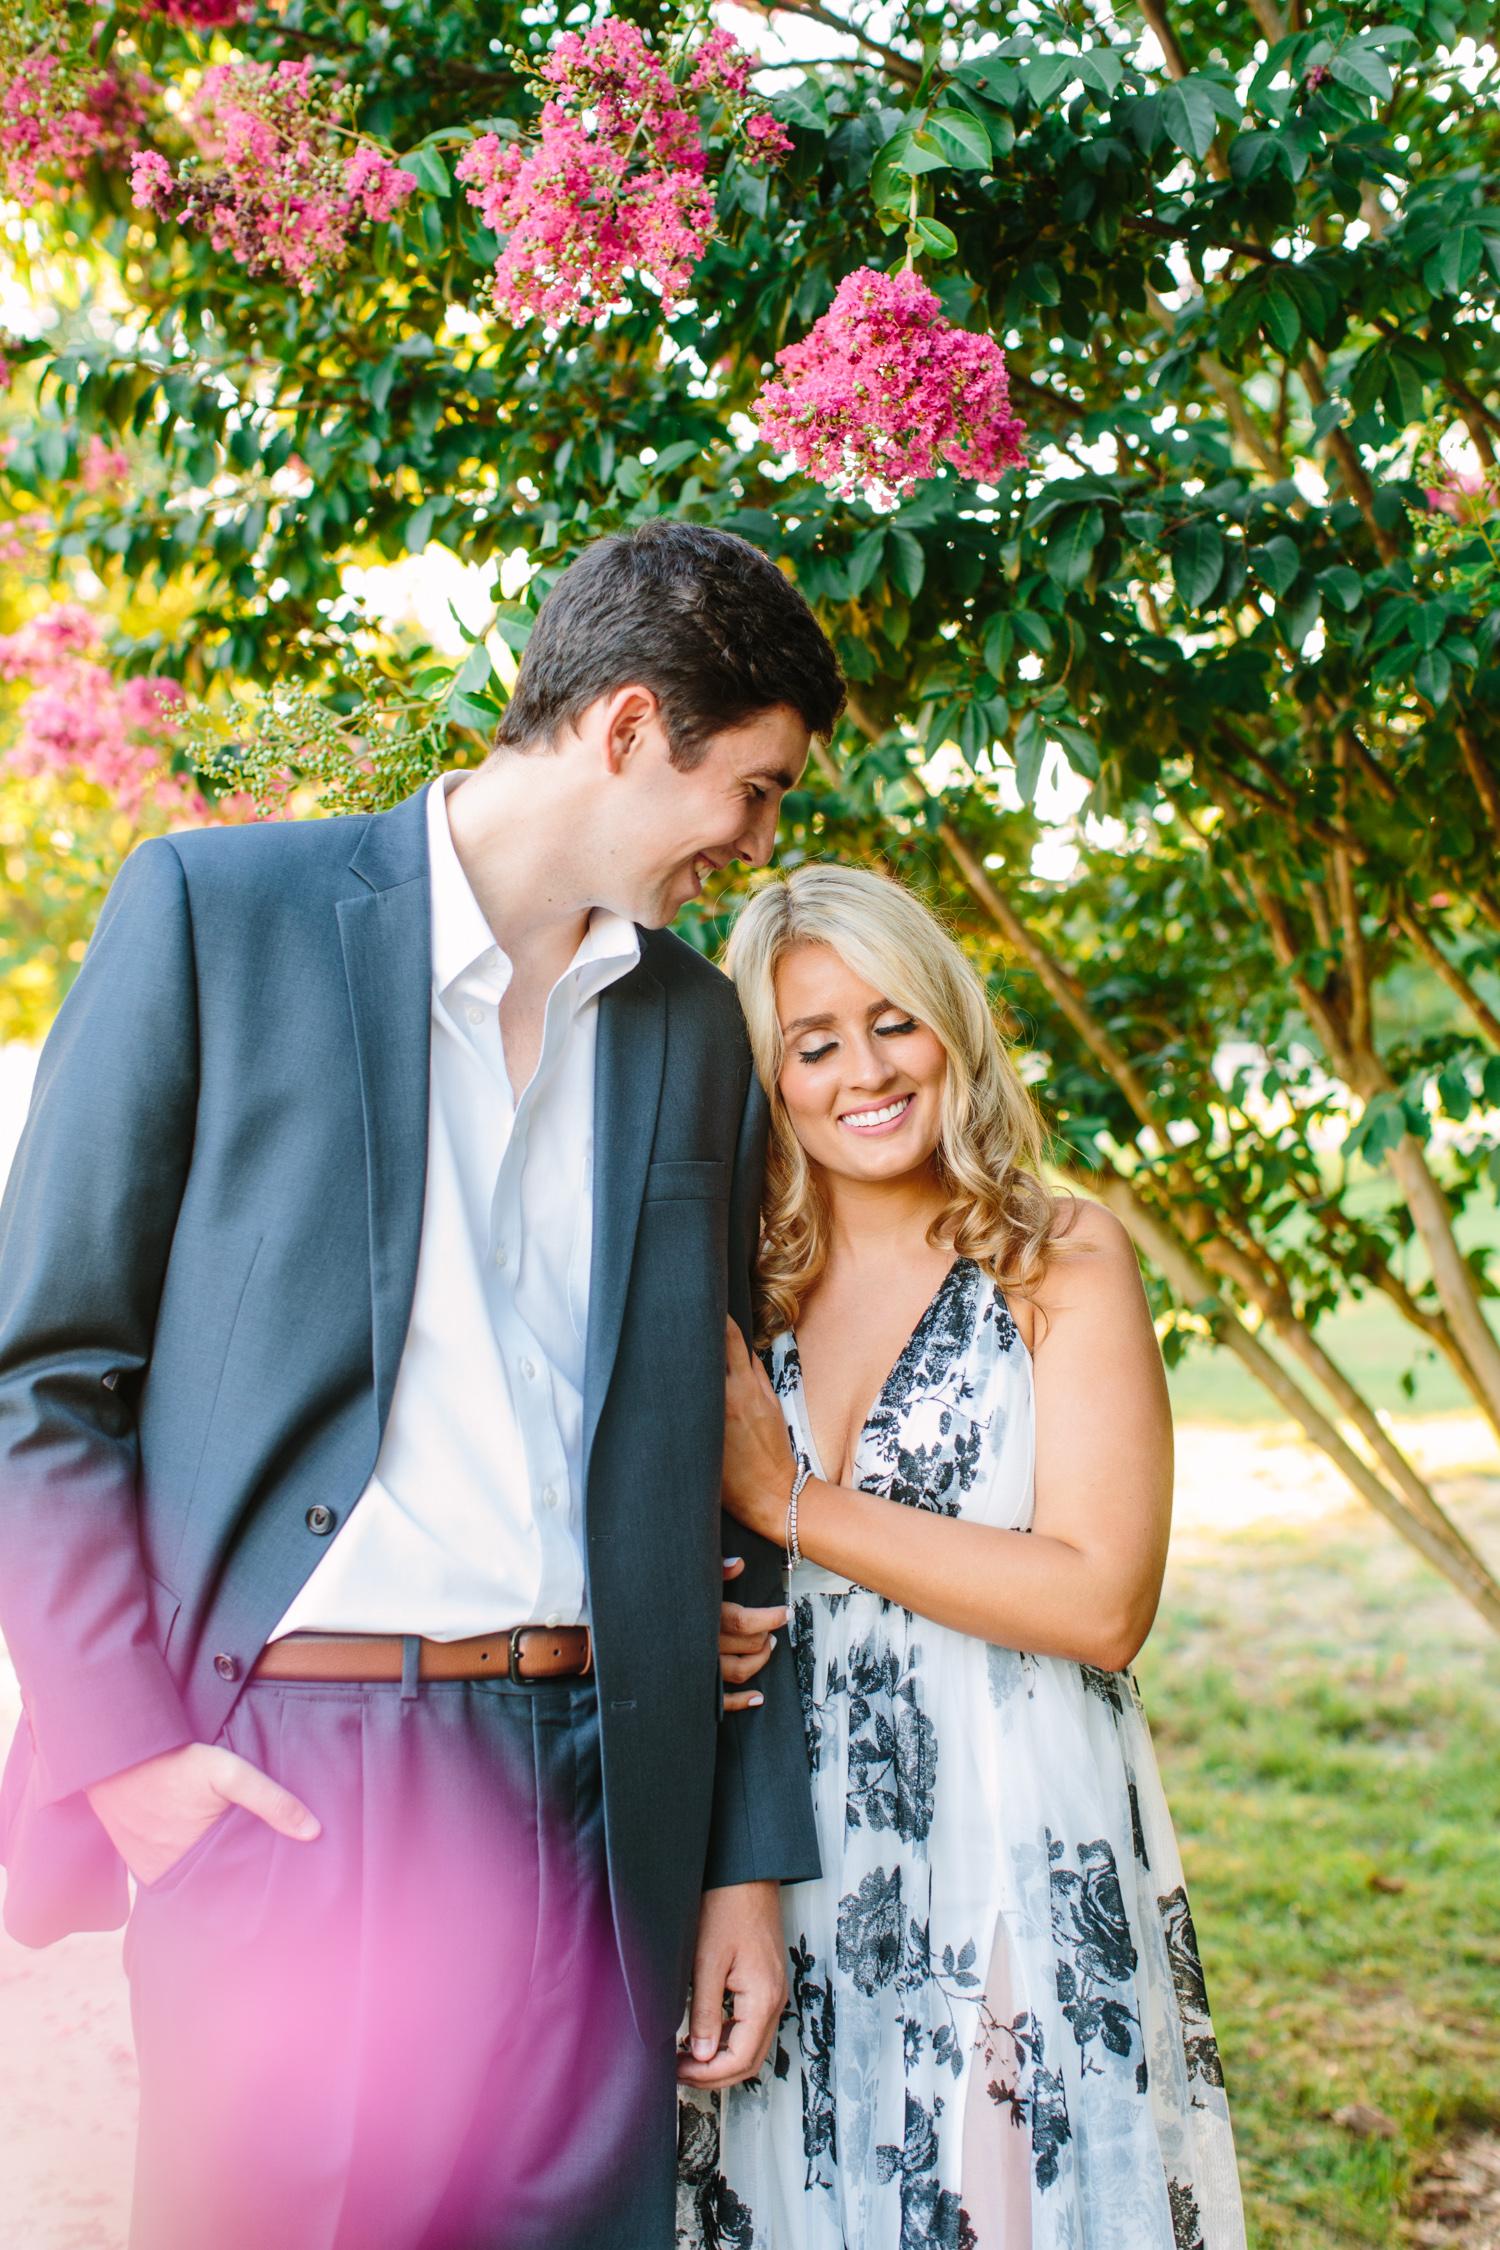 Garden Sunset Engagement Photos // Knoxville Photographer // Suzy Collins Photography